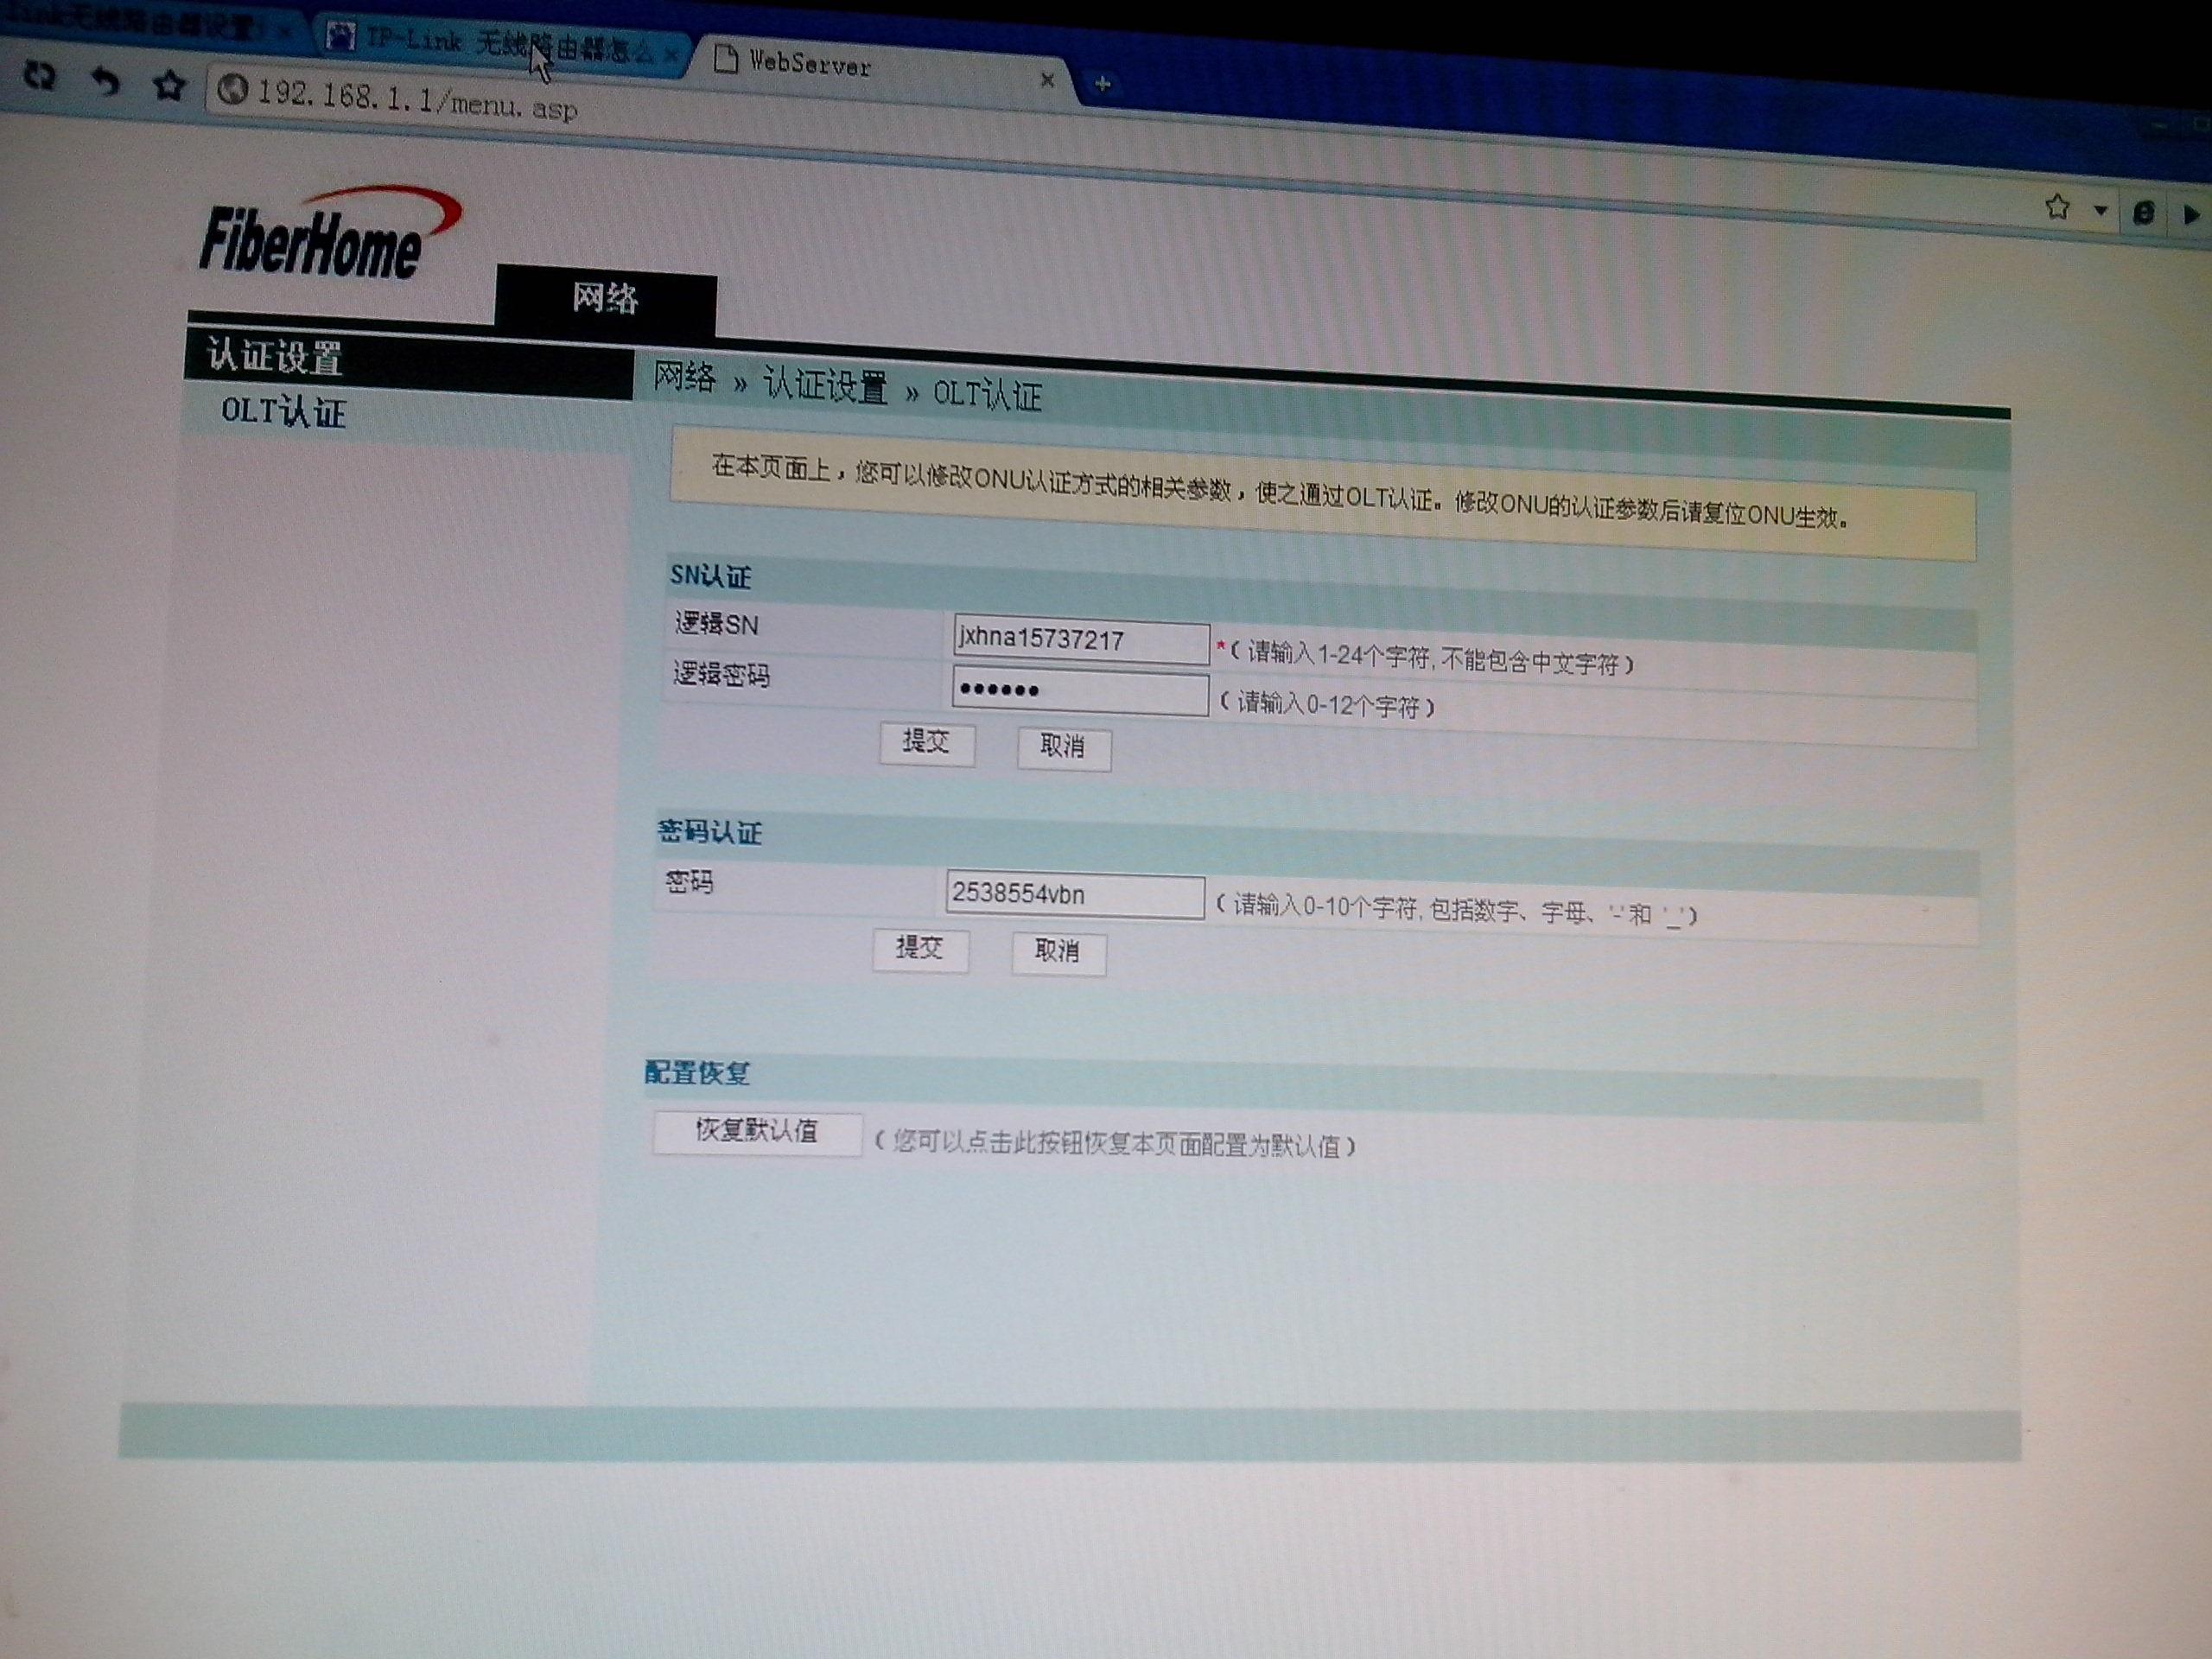 tplink登录192.168.1.1后页面显示不对.